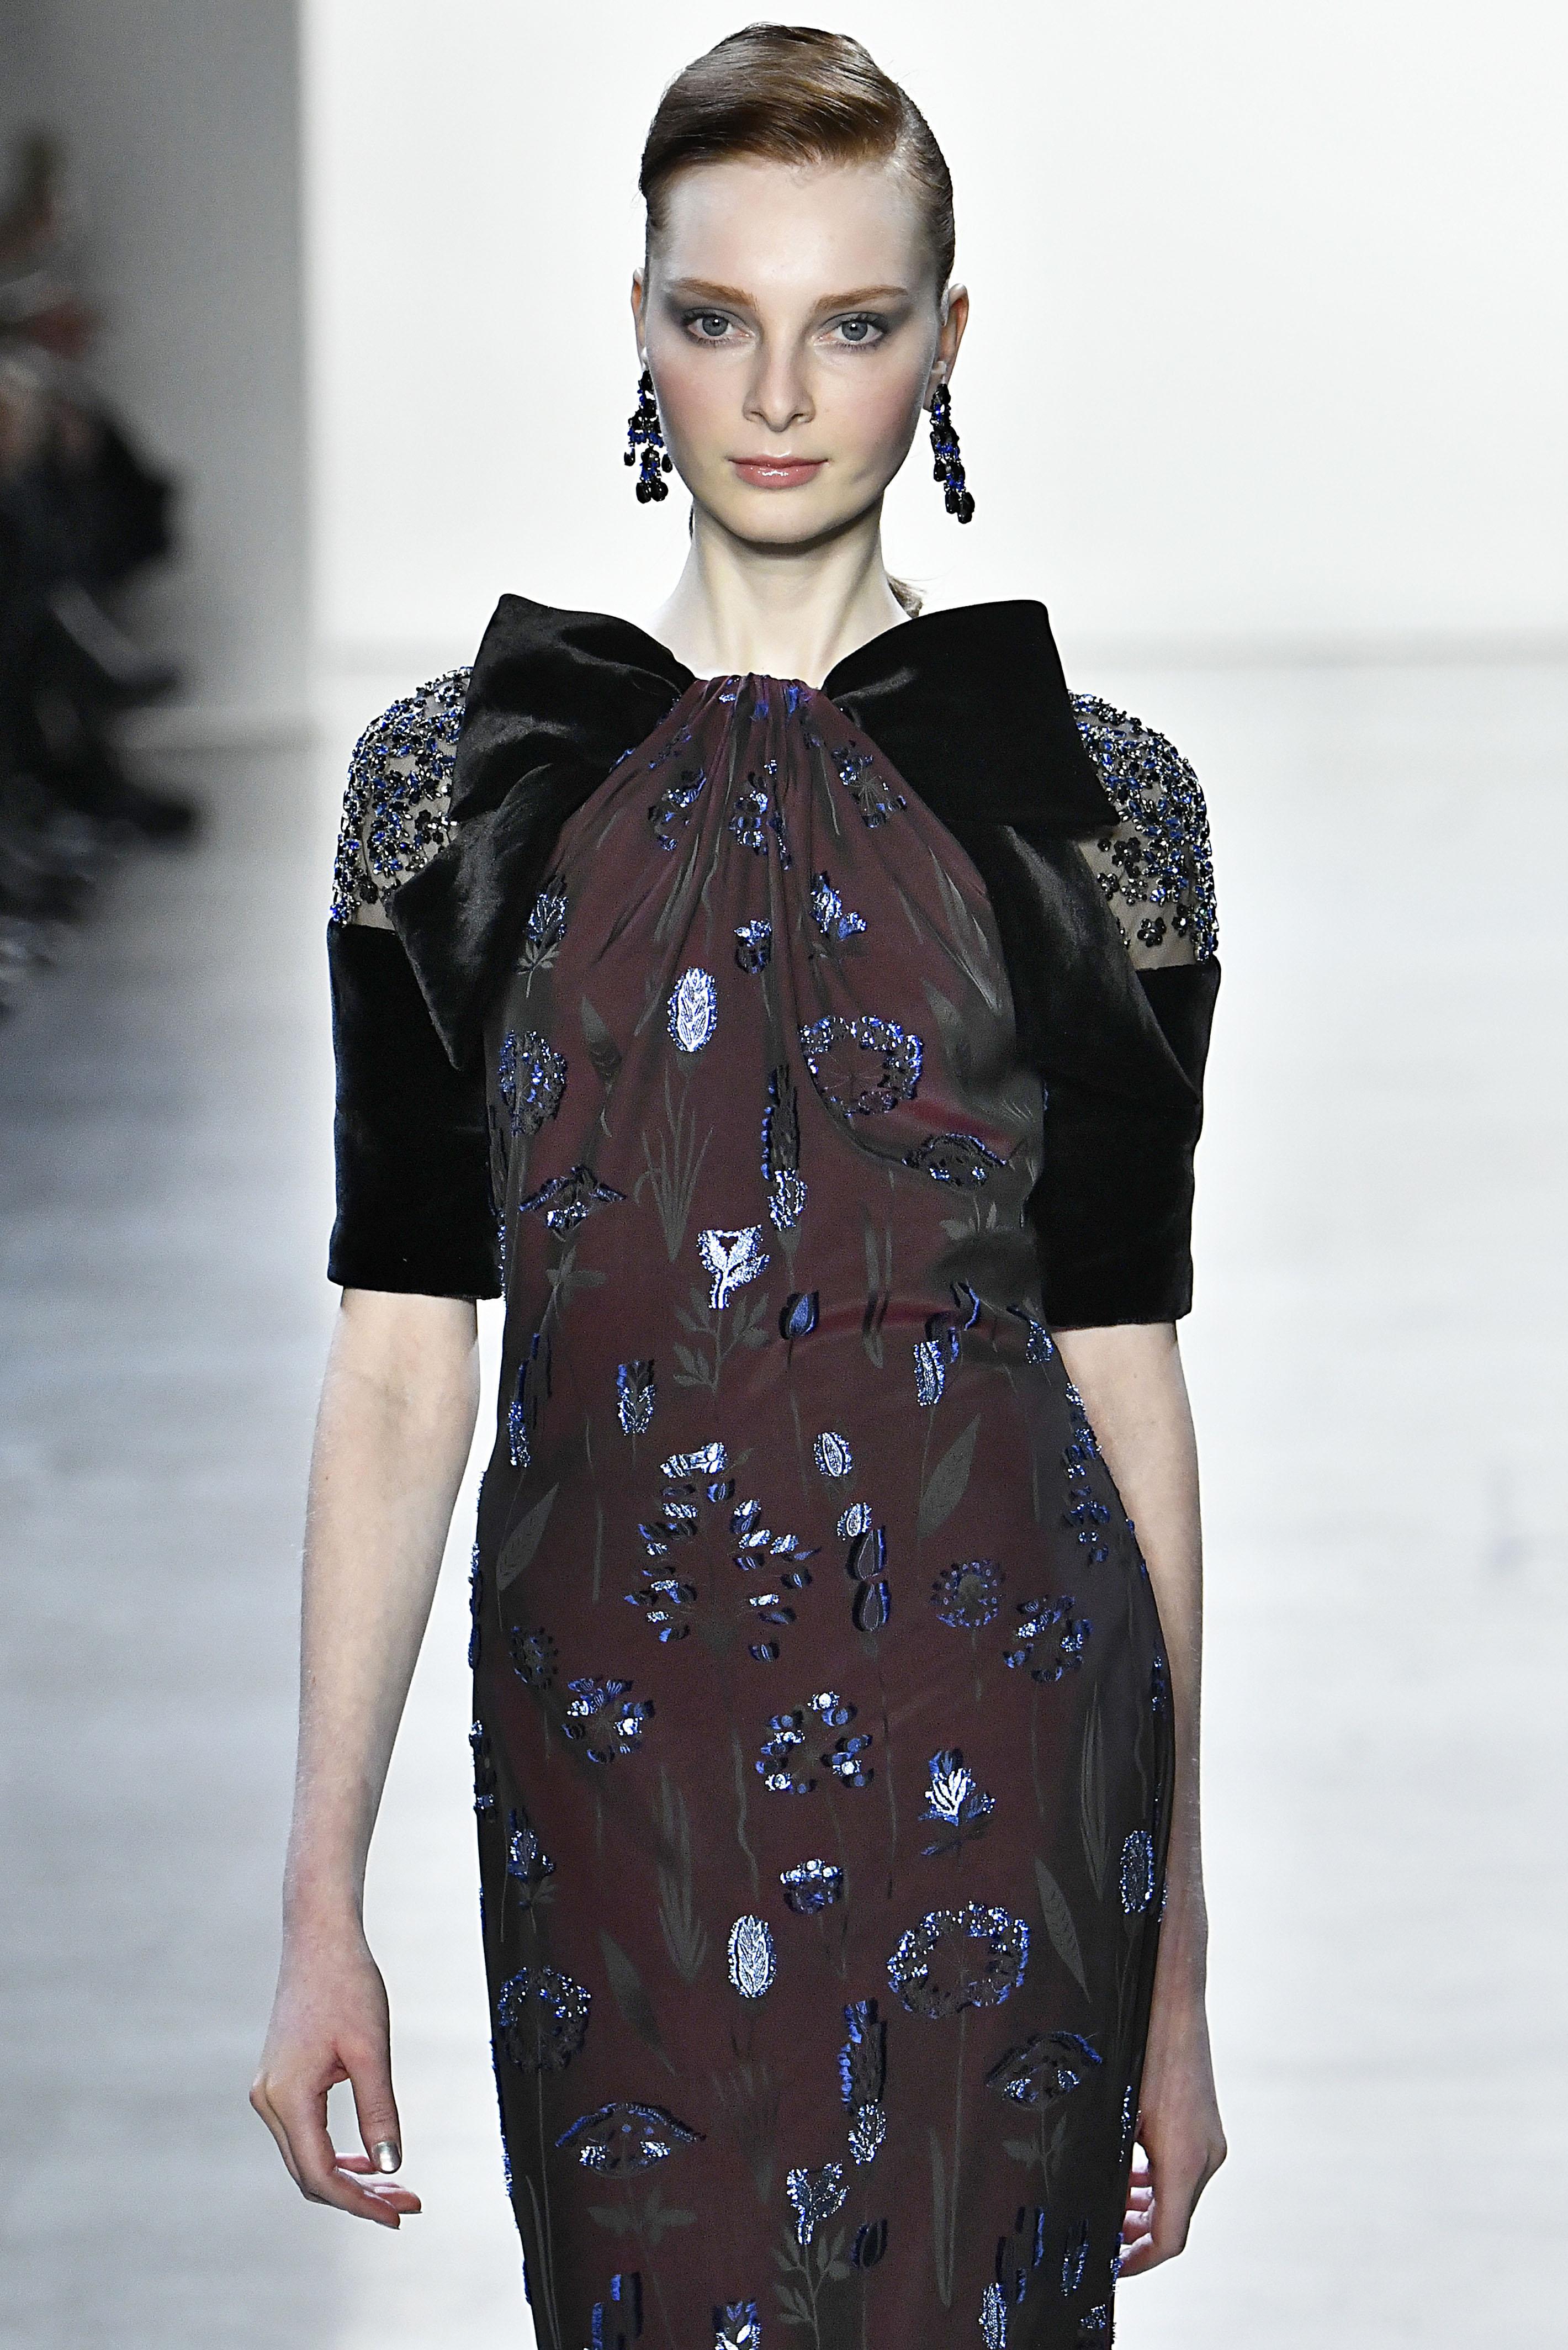 Badgley Mischka - Runway - February 2019 - New York Fashion Week